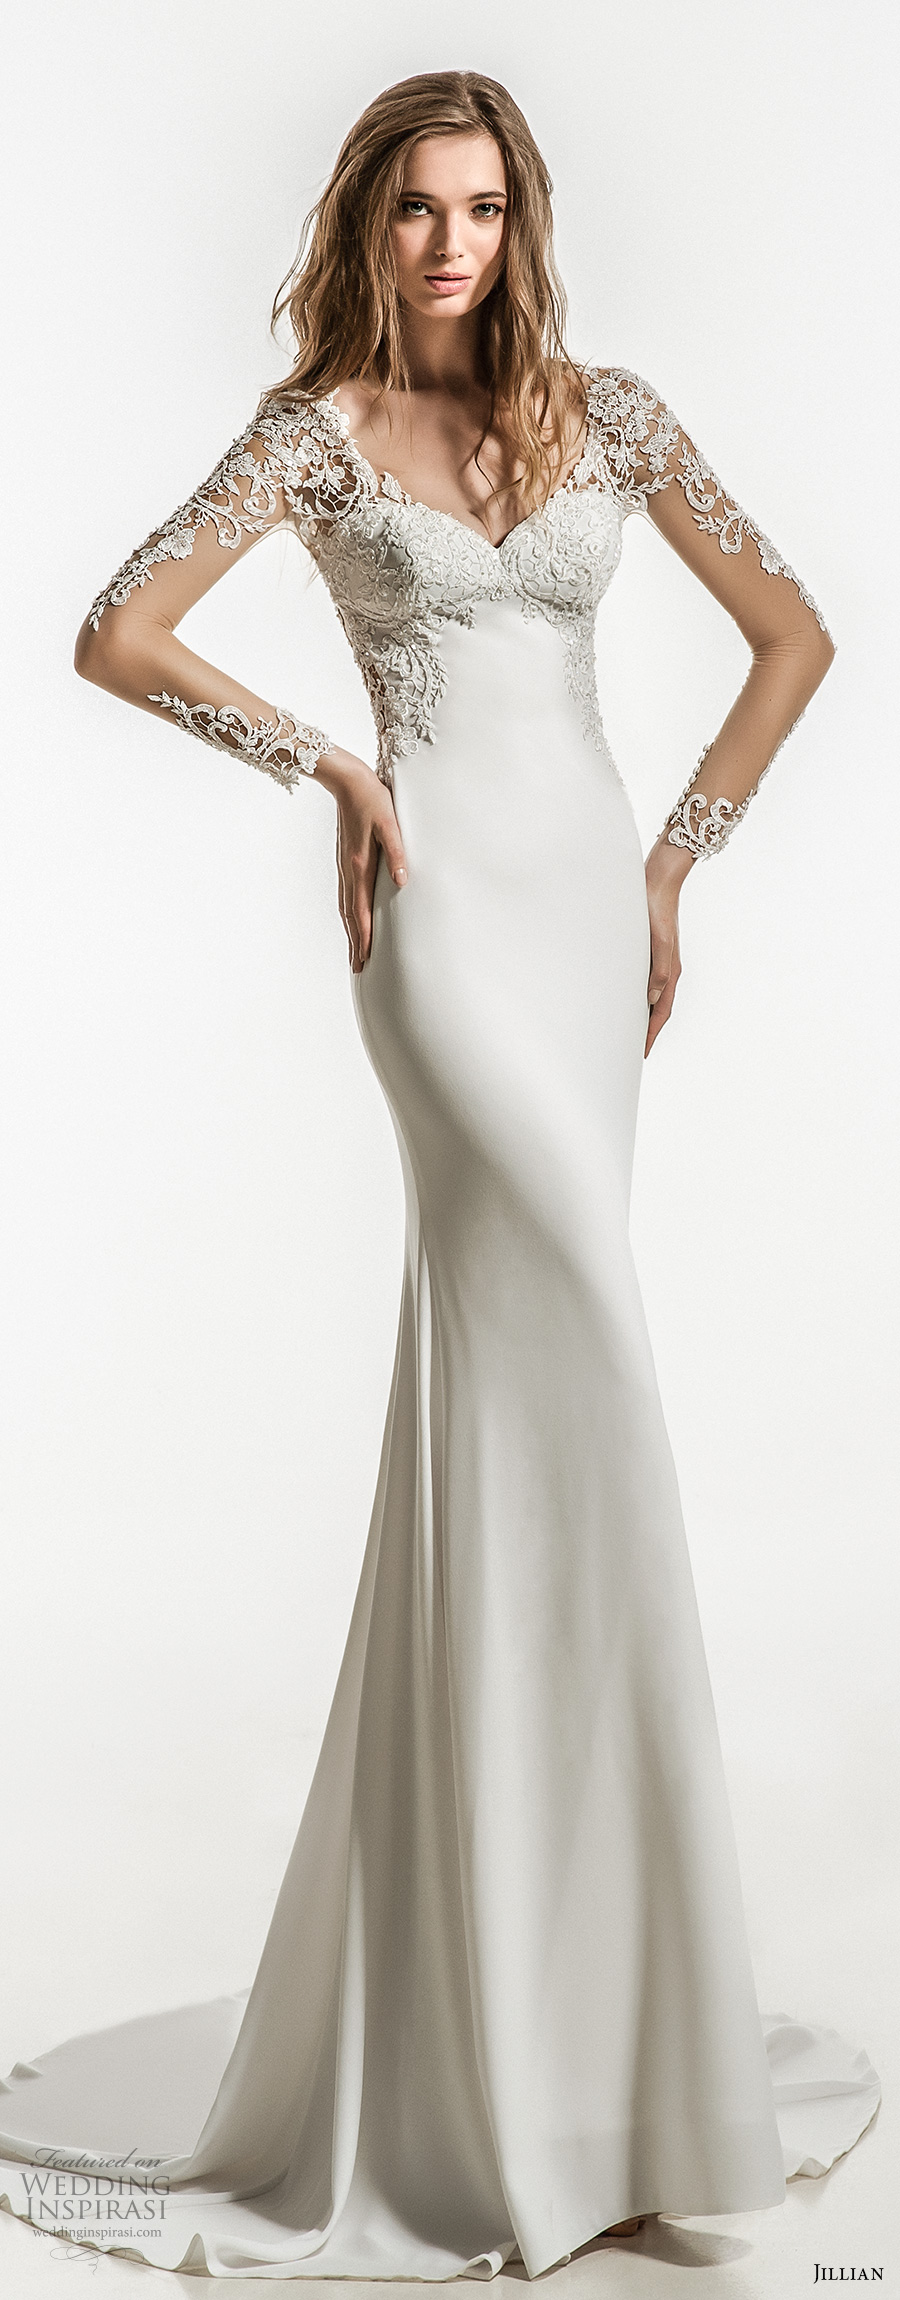 jillian 2018 bridal long sleeves sweetheart neckline heavily embellished bodice clean skirt elegant sheath wedding dress sheer button back short train (12) mv